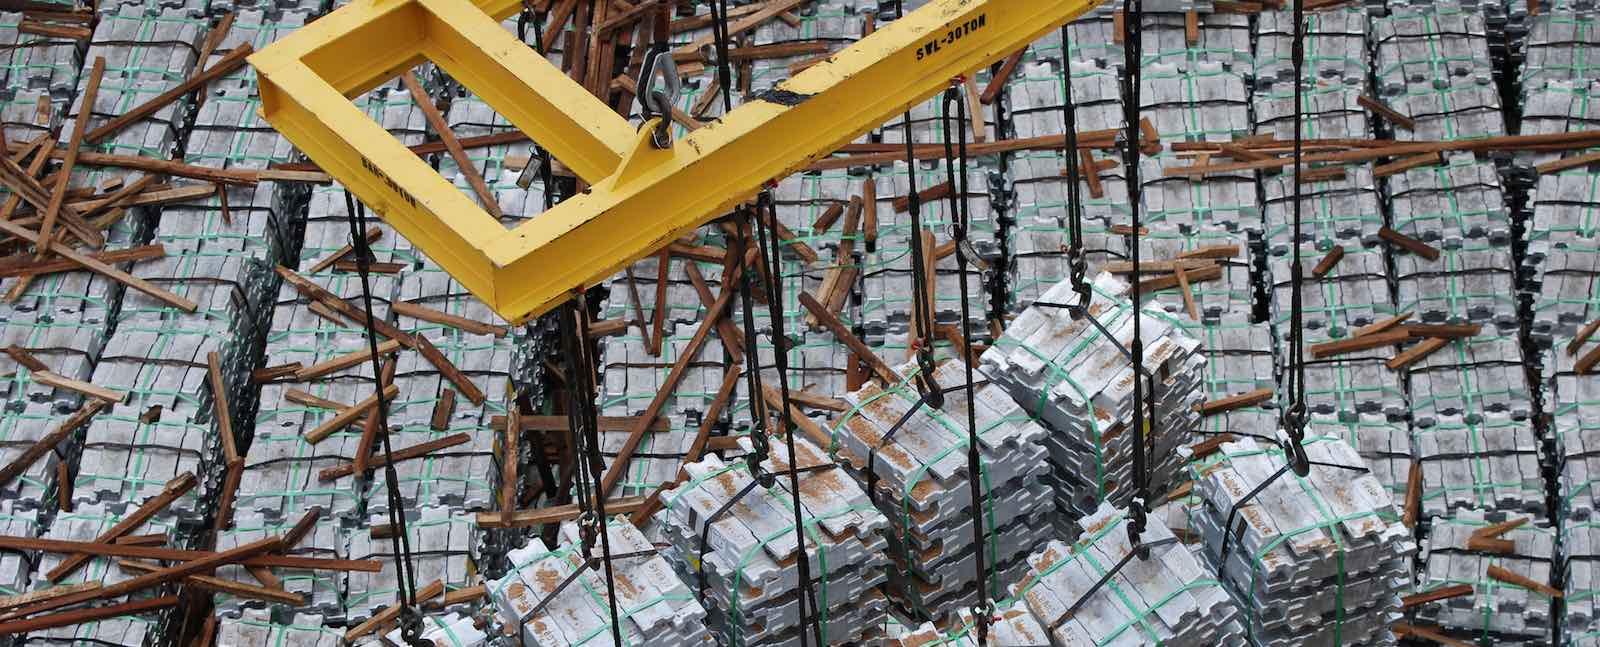 Aluminium ingots unloaded at Talleyrand Marine Terminal, Florida, US (Photo: Jaxport/Flickr)